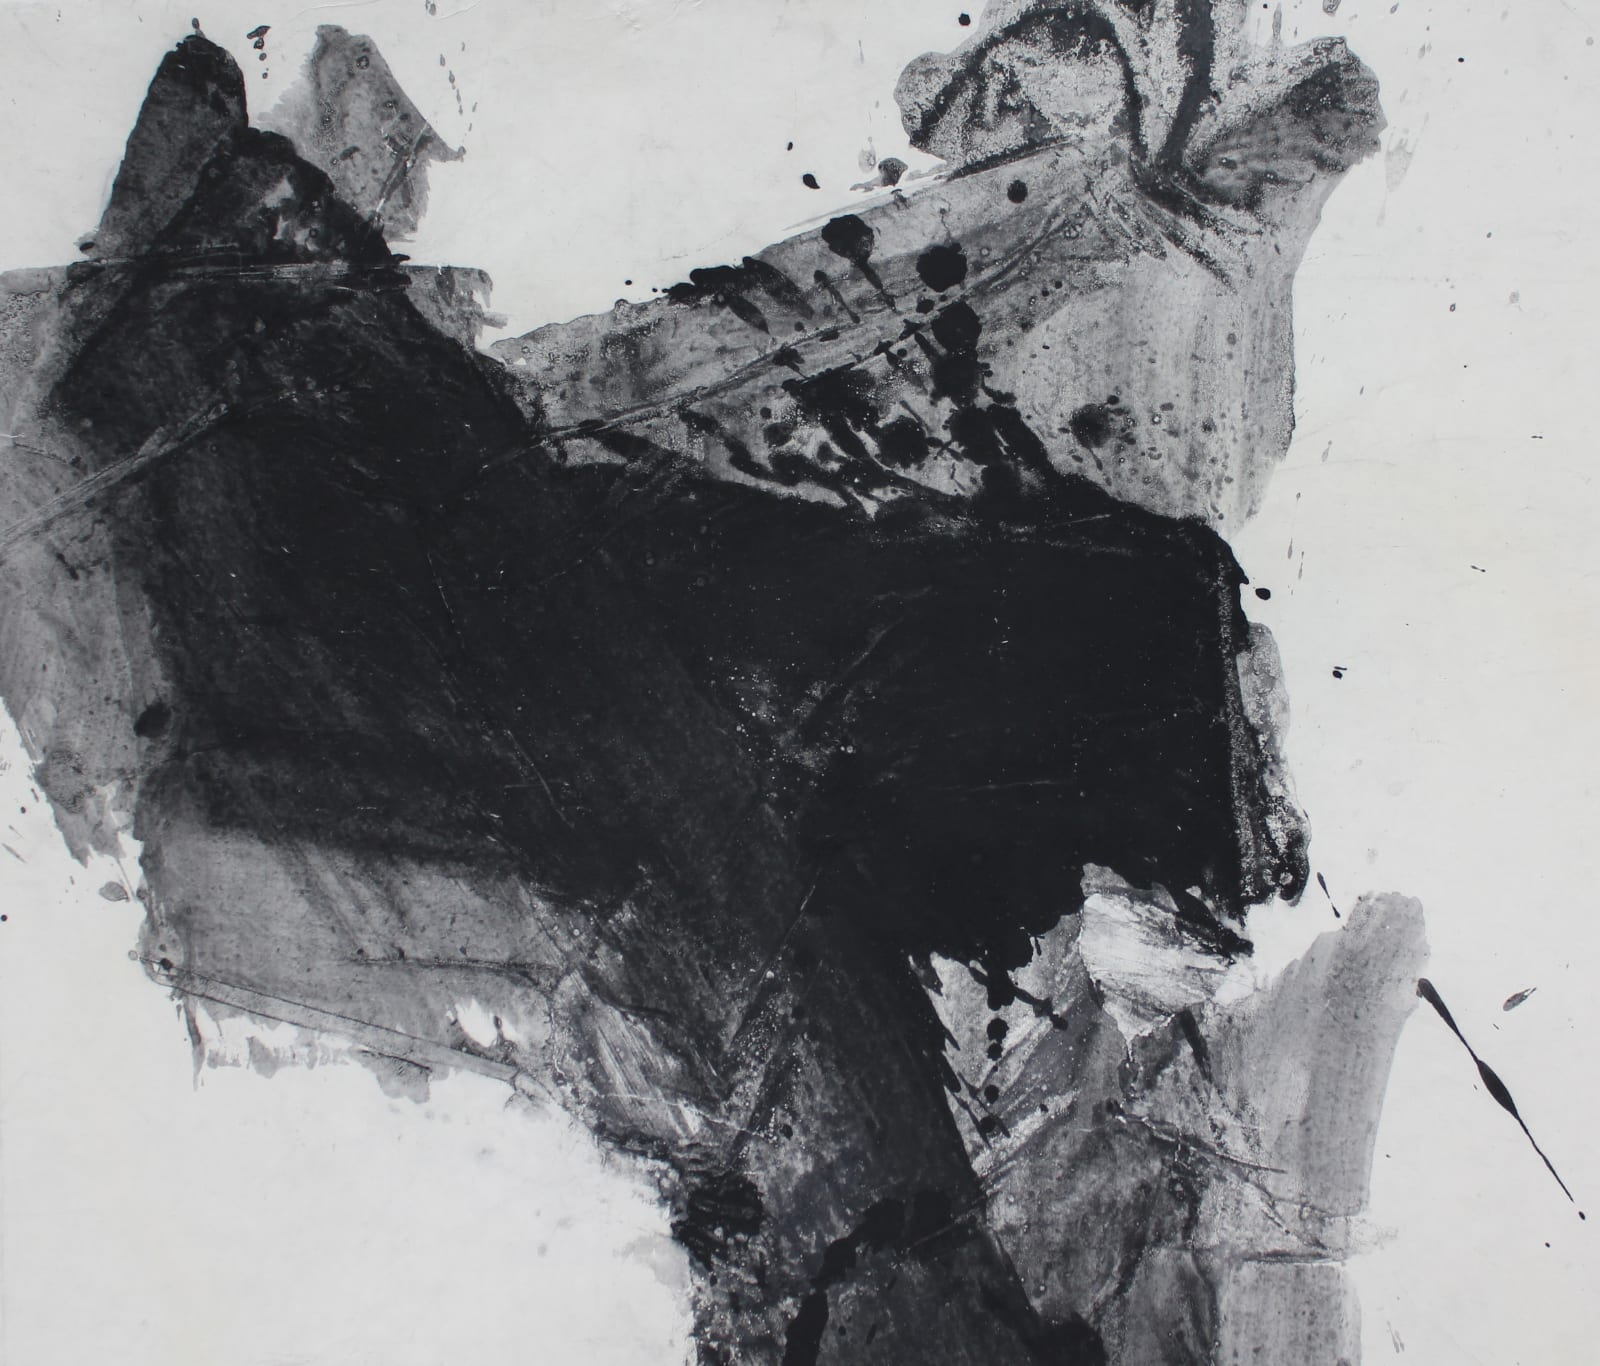 Lan Zhenghui 藍正輝, D Series No. 15 D系列之十五, 2009